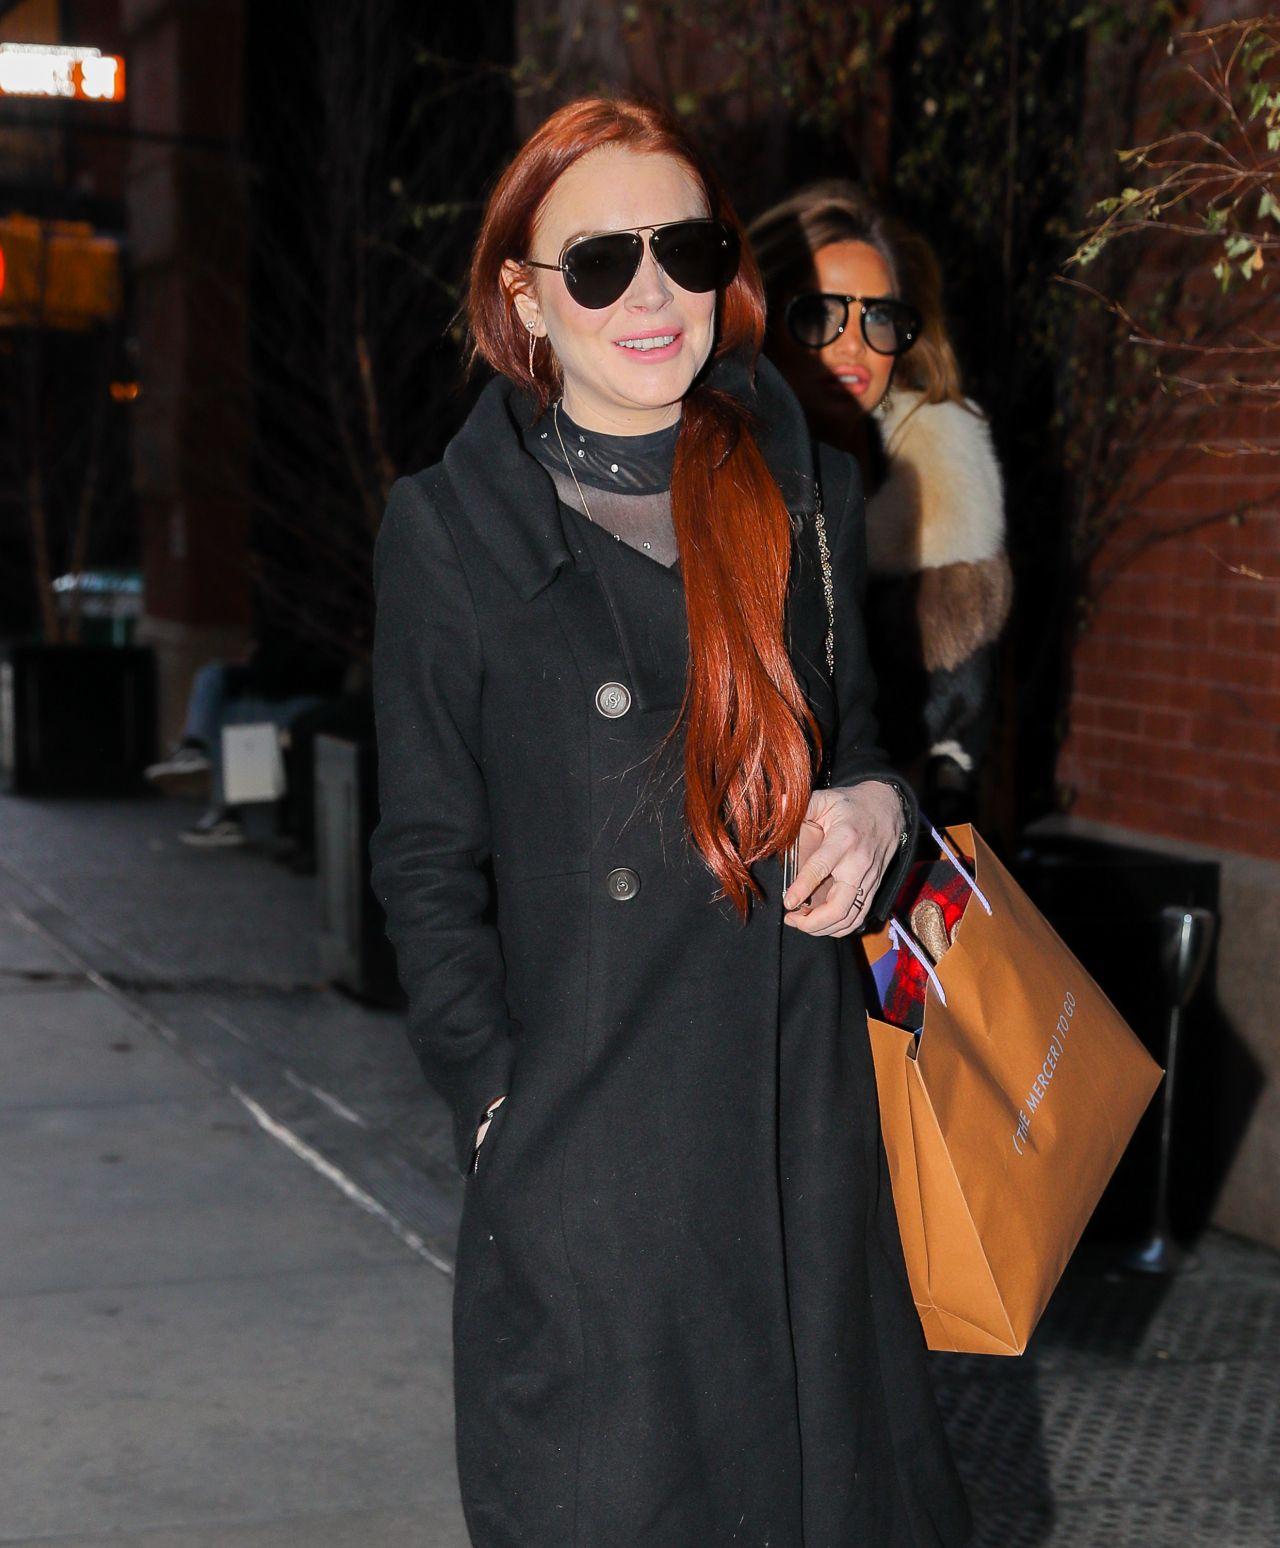 Lindsay Lohan gets emotional over Beach Club slap fight ...